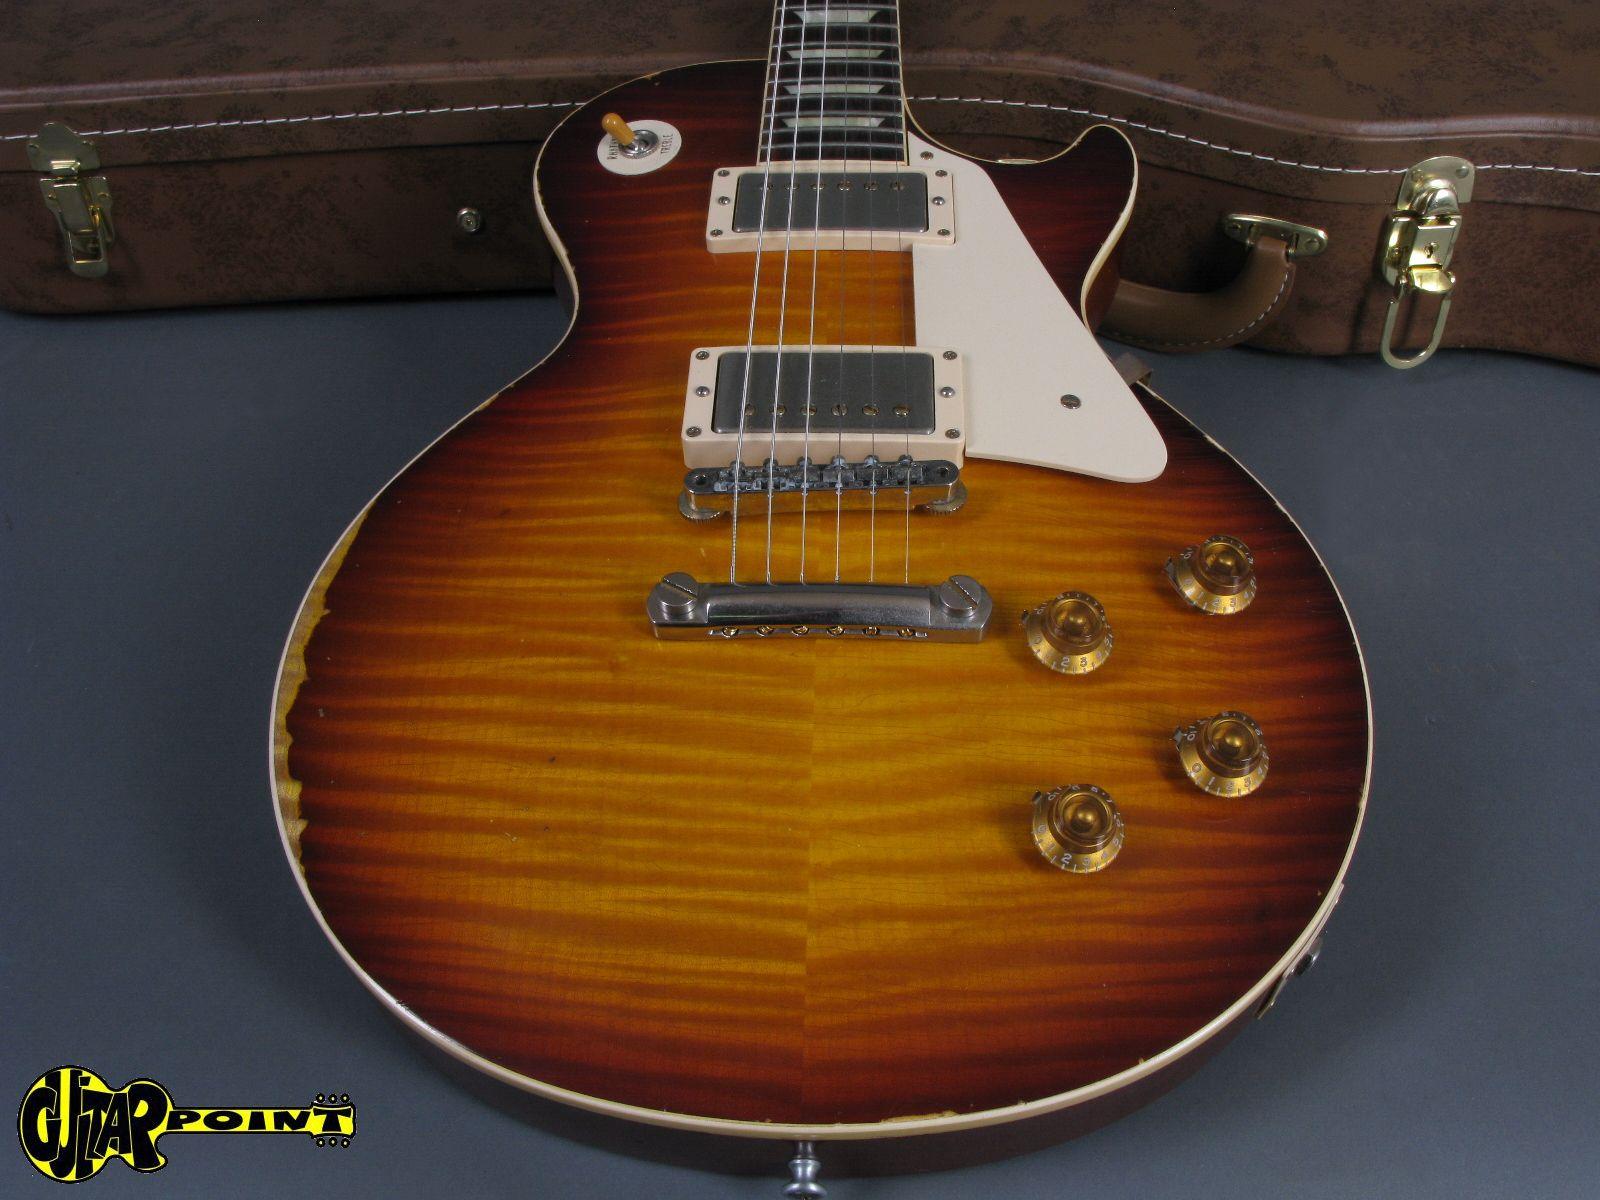 gibson 1959 les paul reissue heavy aged 2013 texas burst guitar for sale guitarpoint. Black Bedroom Furniture Sets. Home Design Ideas